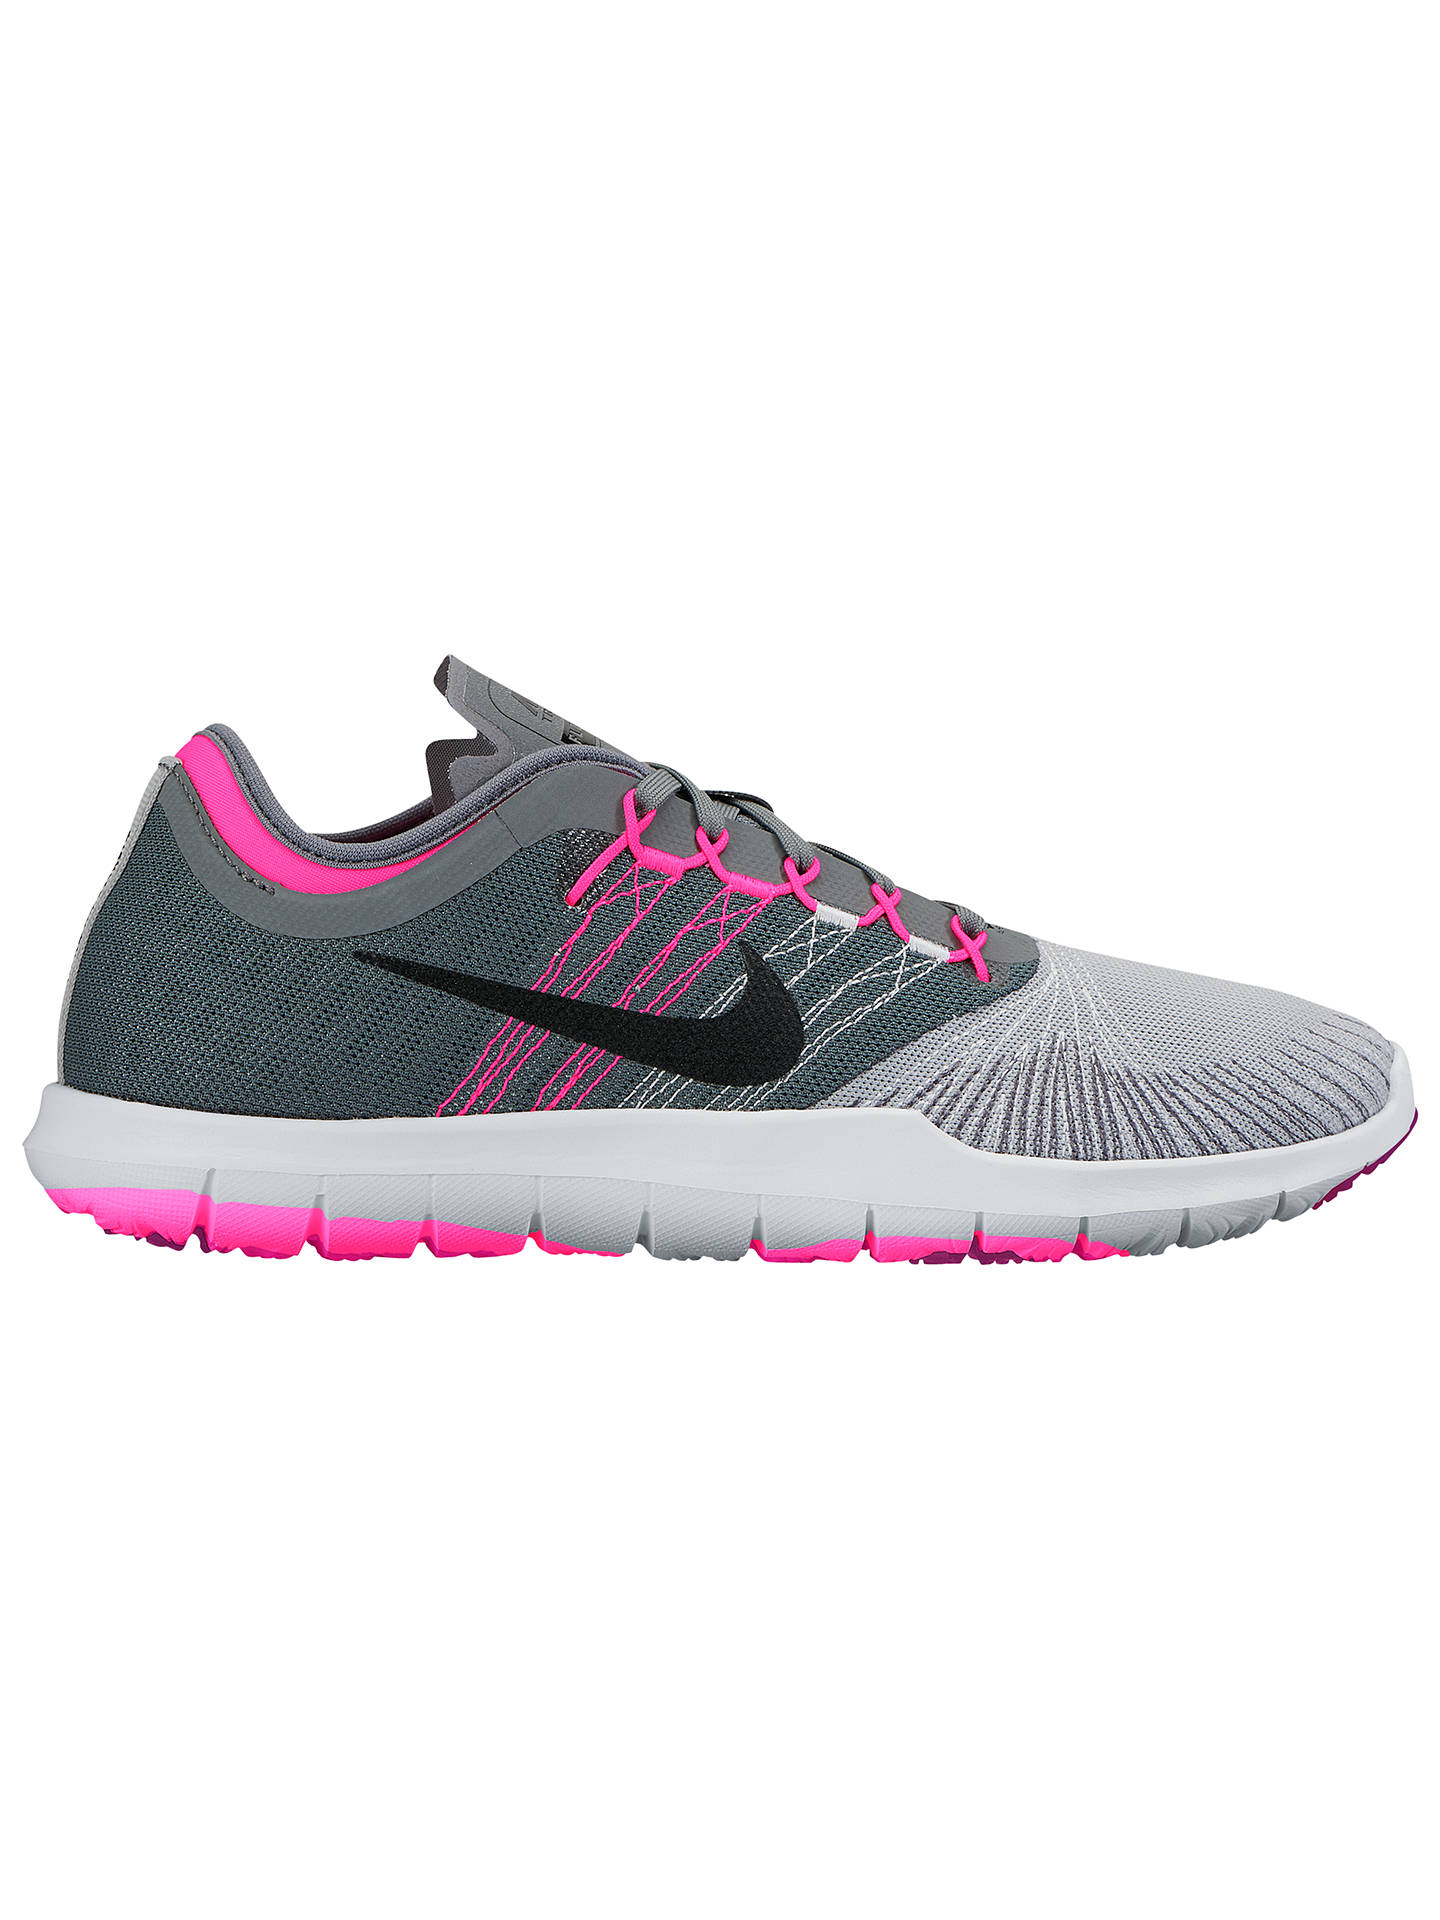 443a9f857e9b Nike Flex Adapt TR Women s Cross Trainers at John Lewis   Partners